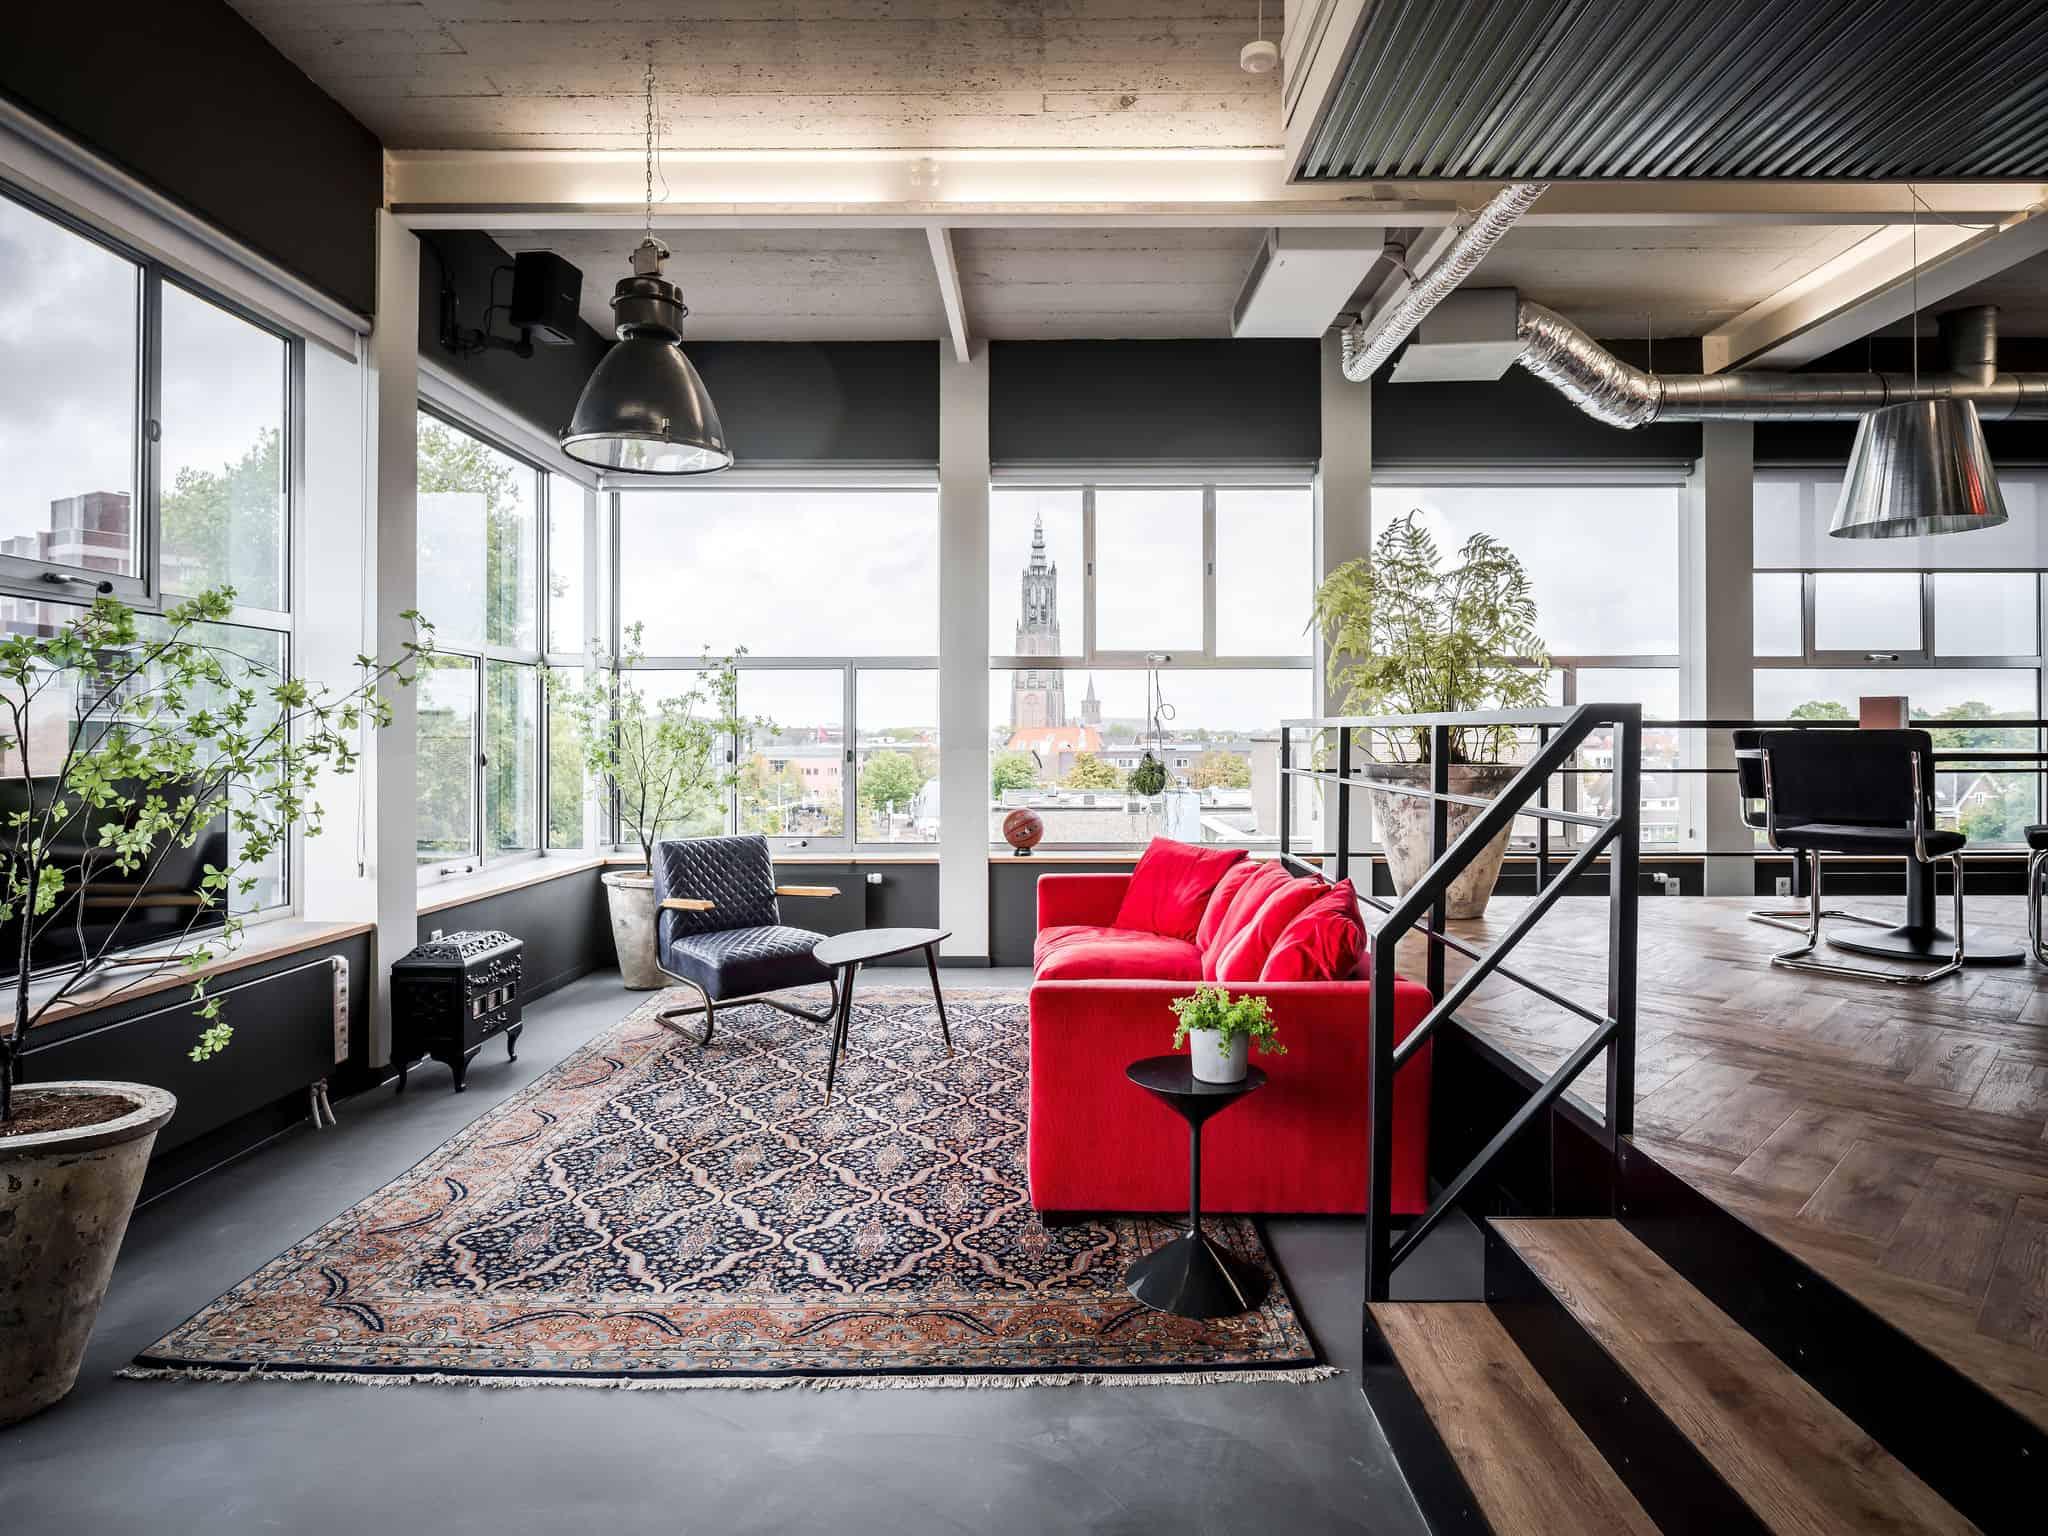 interieurarchitect ontwerpt kantoor aula Newpublic lounge